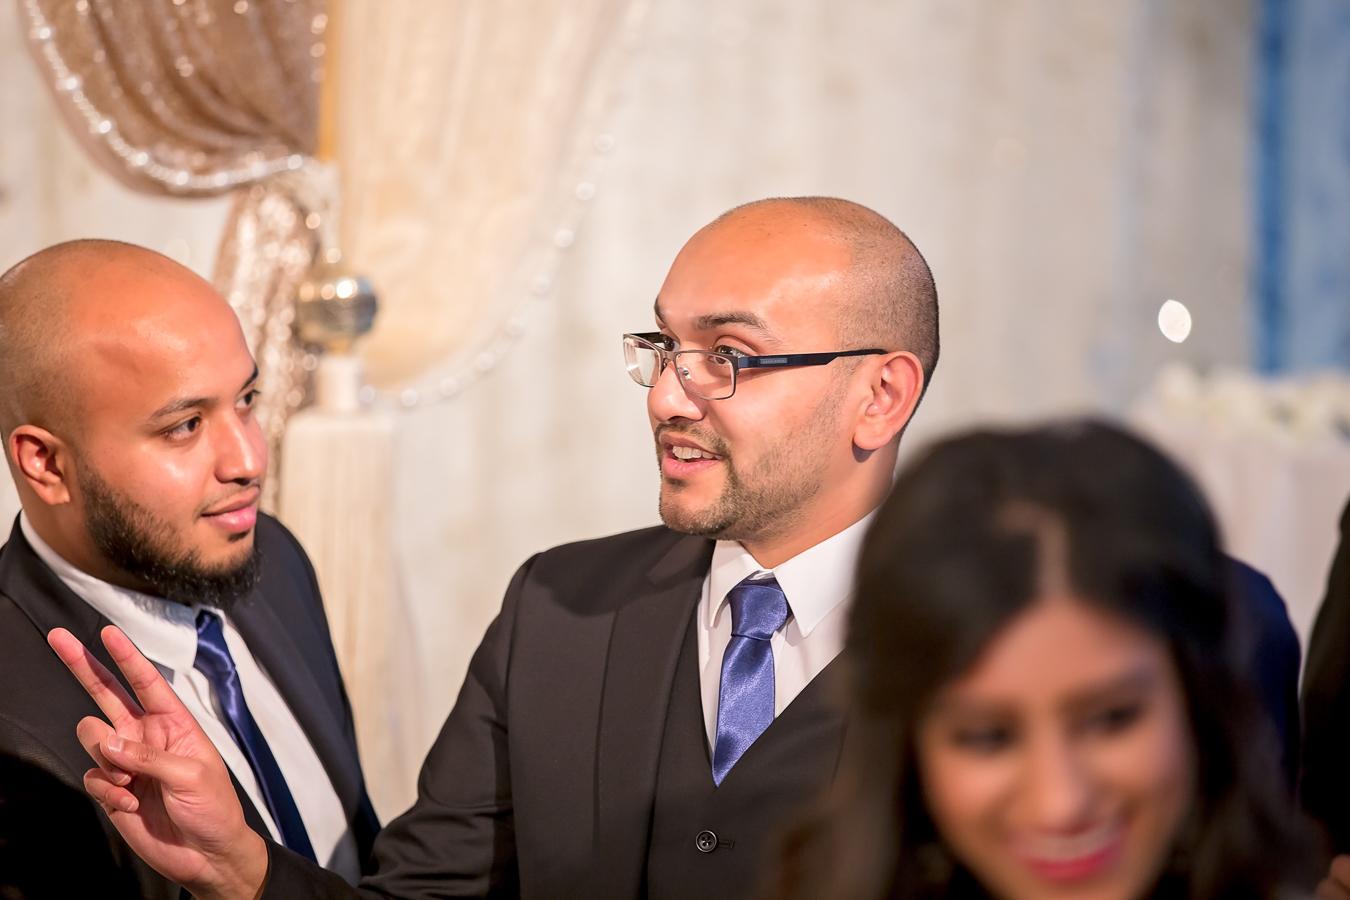 Nasir and Minara wedding at The Sheridan suite Macnchester Didsbury Opu Sultan Photography Manchester and Edinburgh Asian Muslim Hindu Sikh-115.jpg